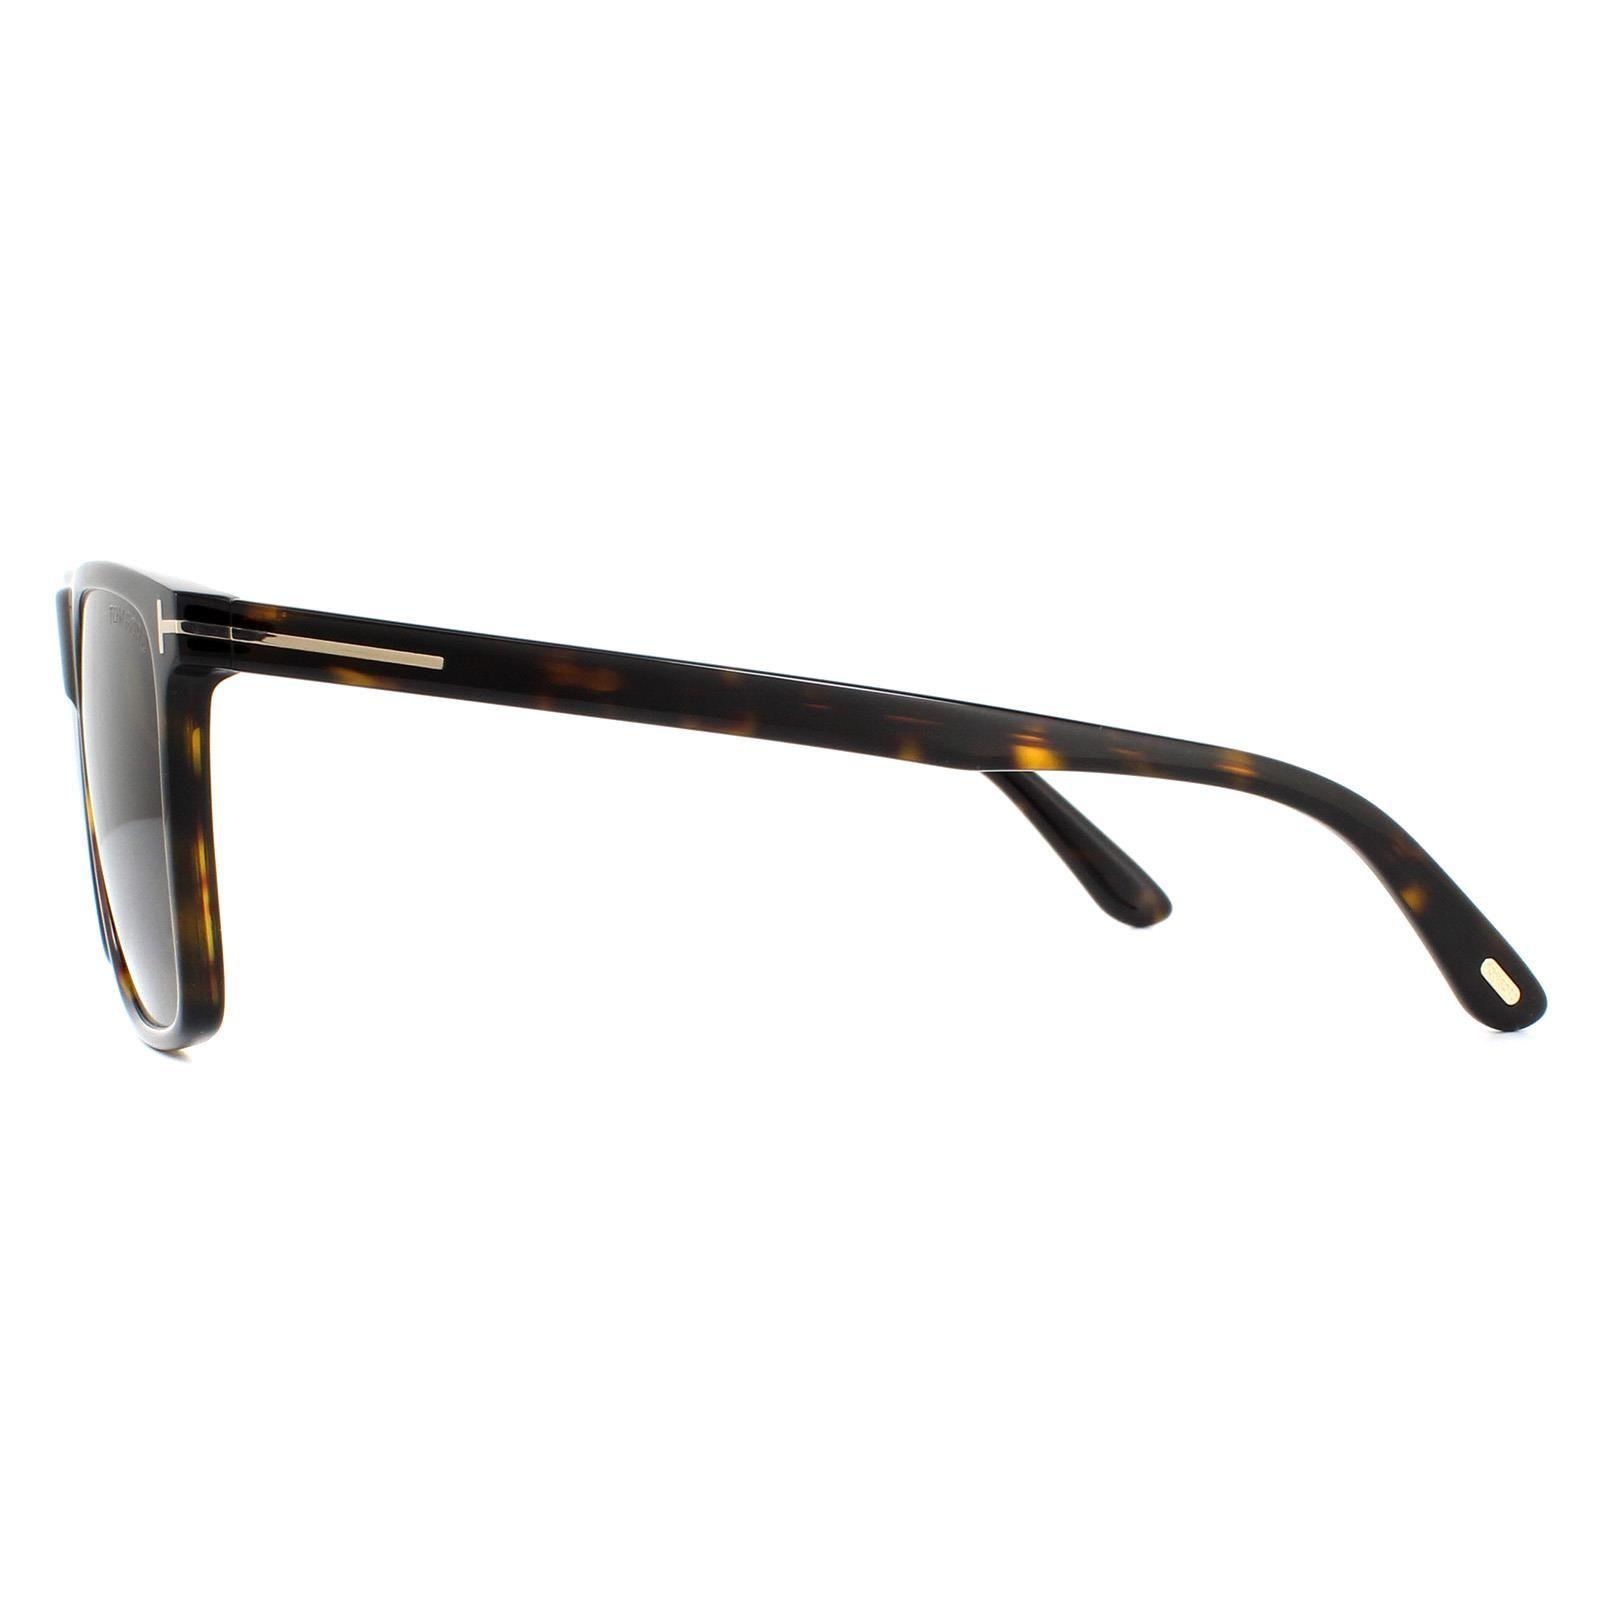 Tom Ford Sunglasses Fletcher FT0832 52J Dark Havana Roviex Brown